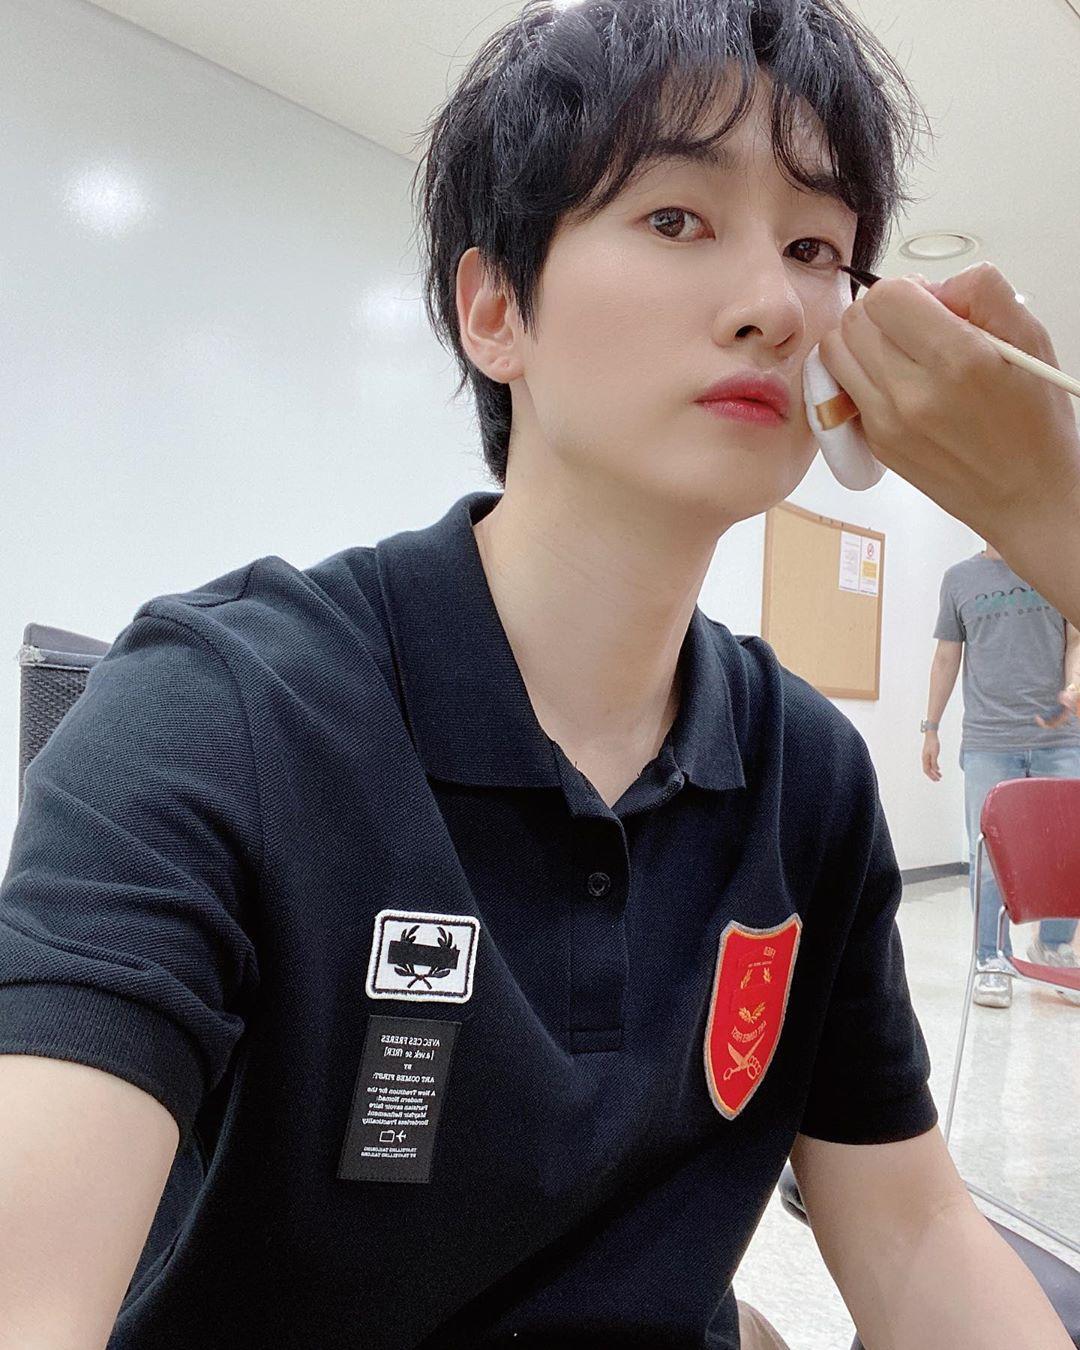 Eunhyuk South Korean Singer, Song Writer, Rapper, Actor